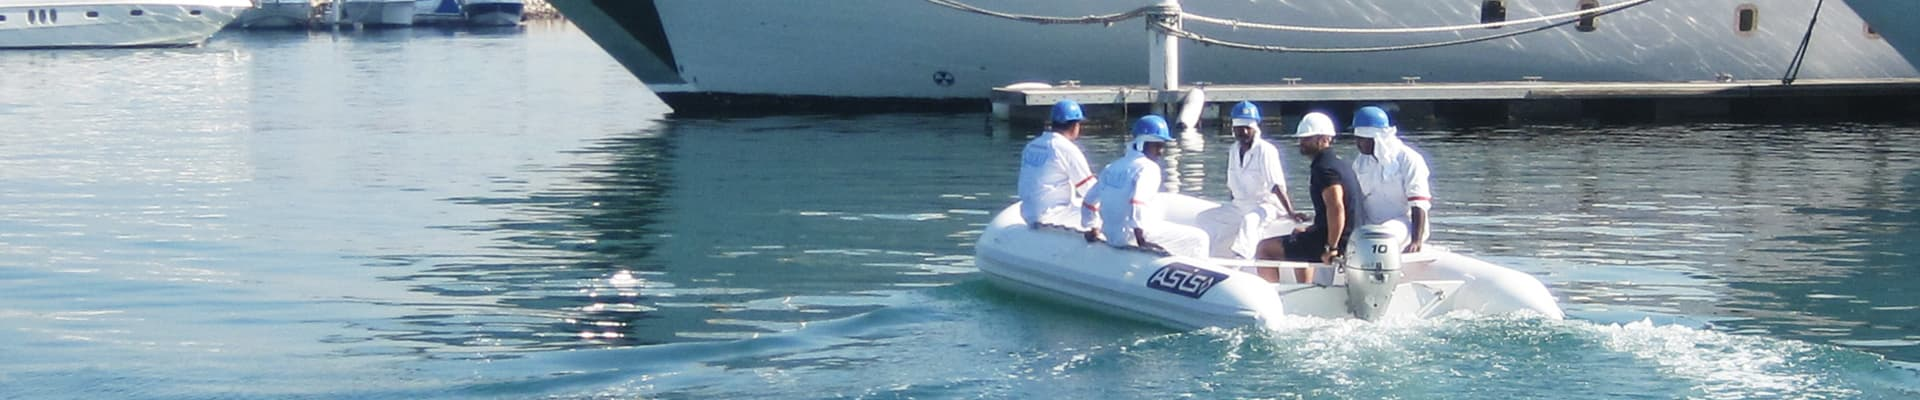 heavy-duty-fully-inflatable-boat